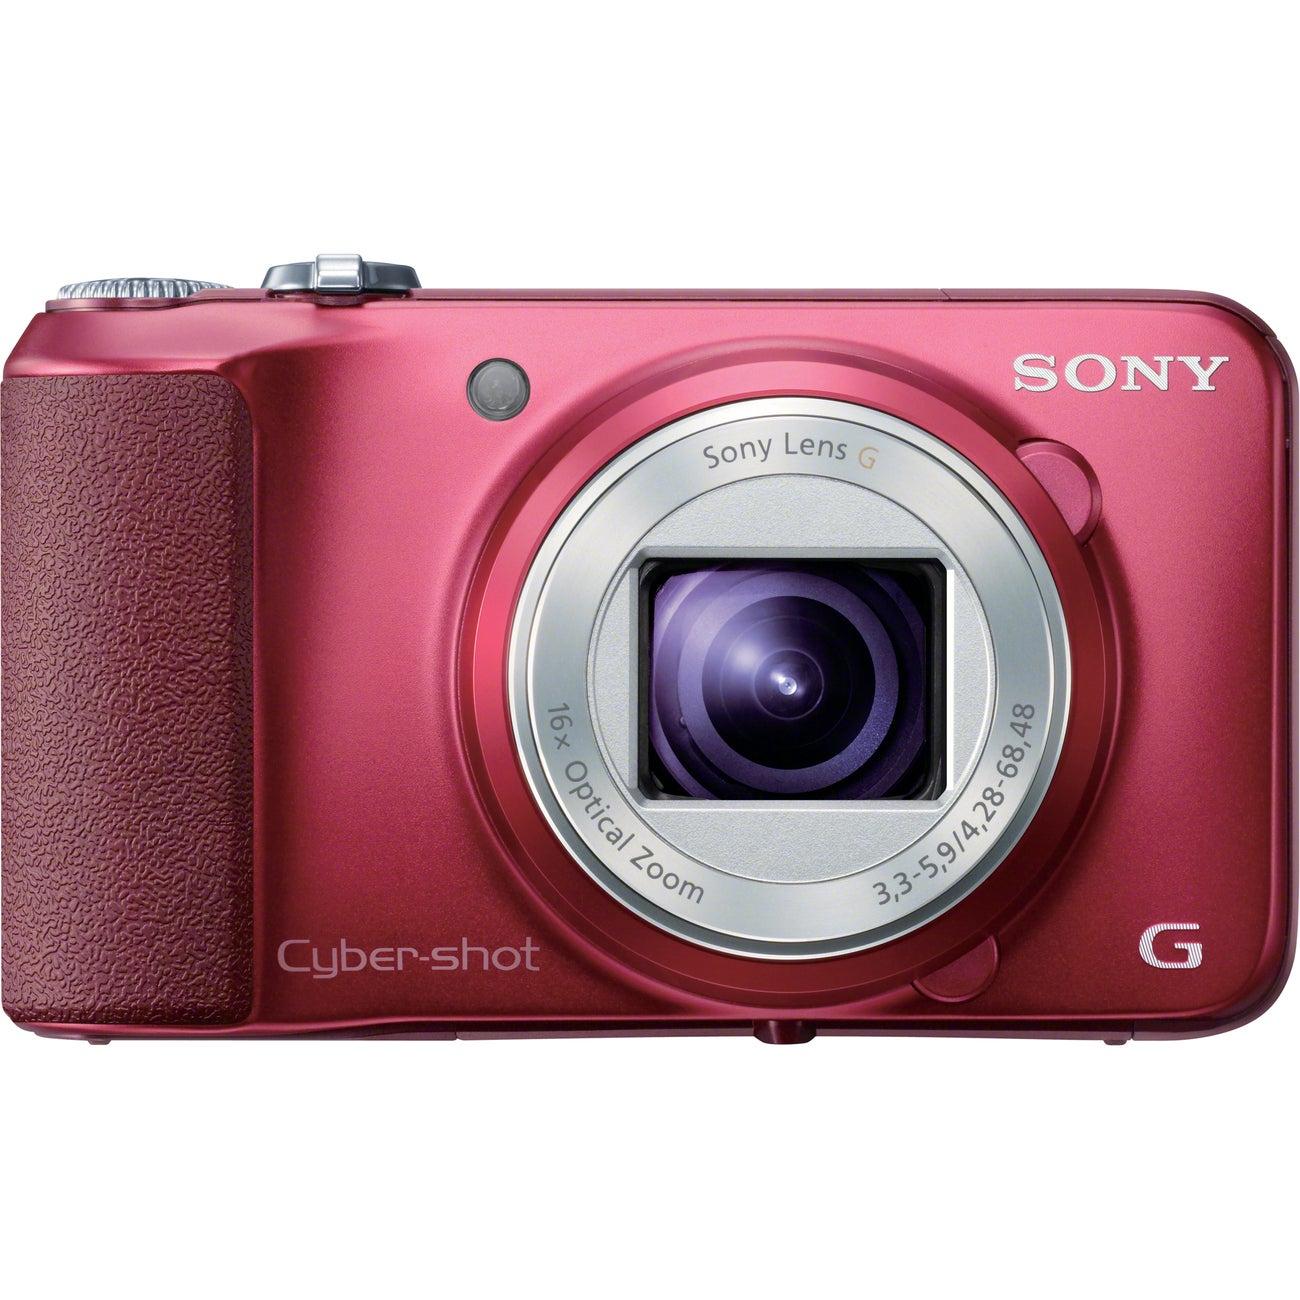 Sony Cyber-shot DSC-H90 16.1MP Red Digital Camera